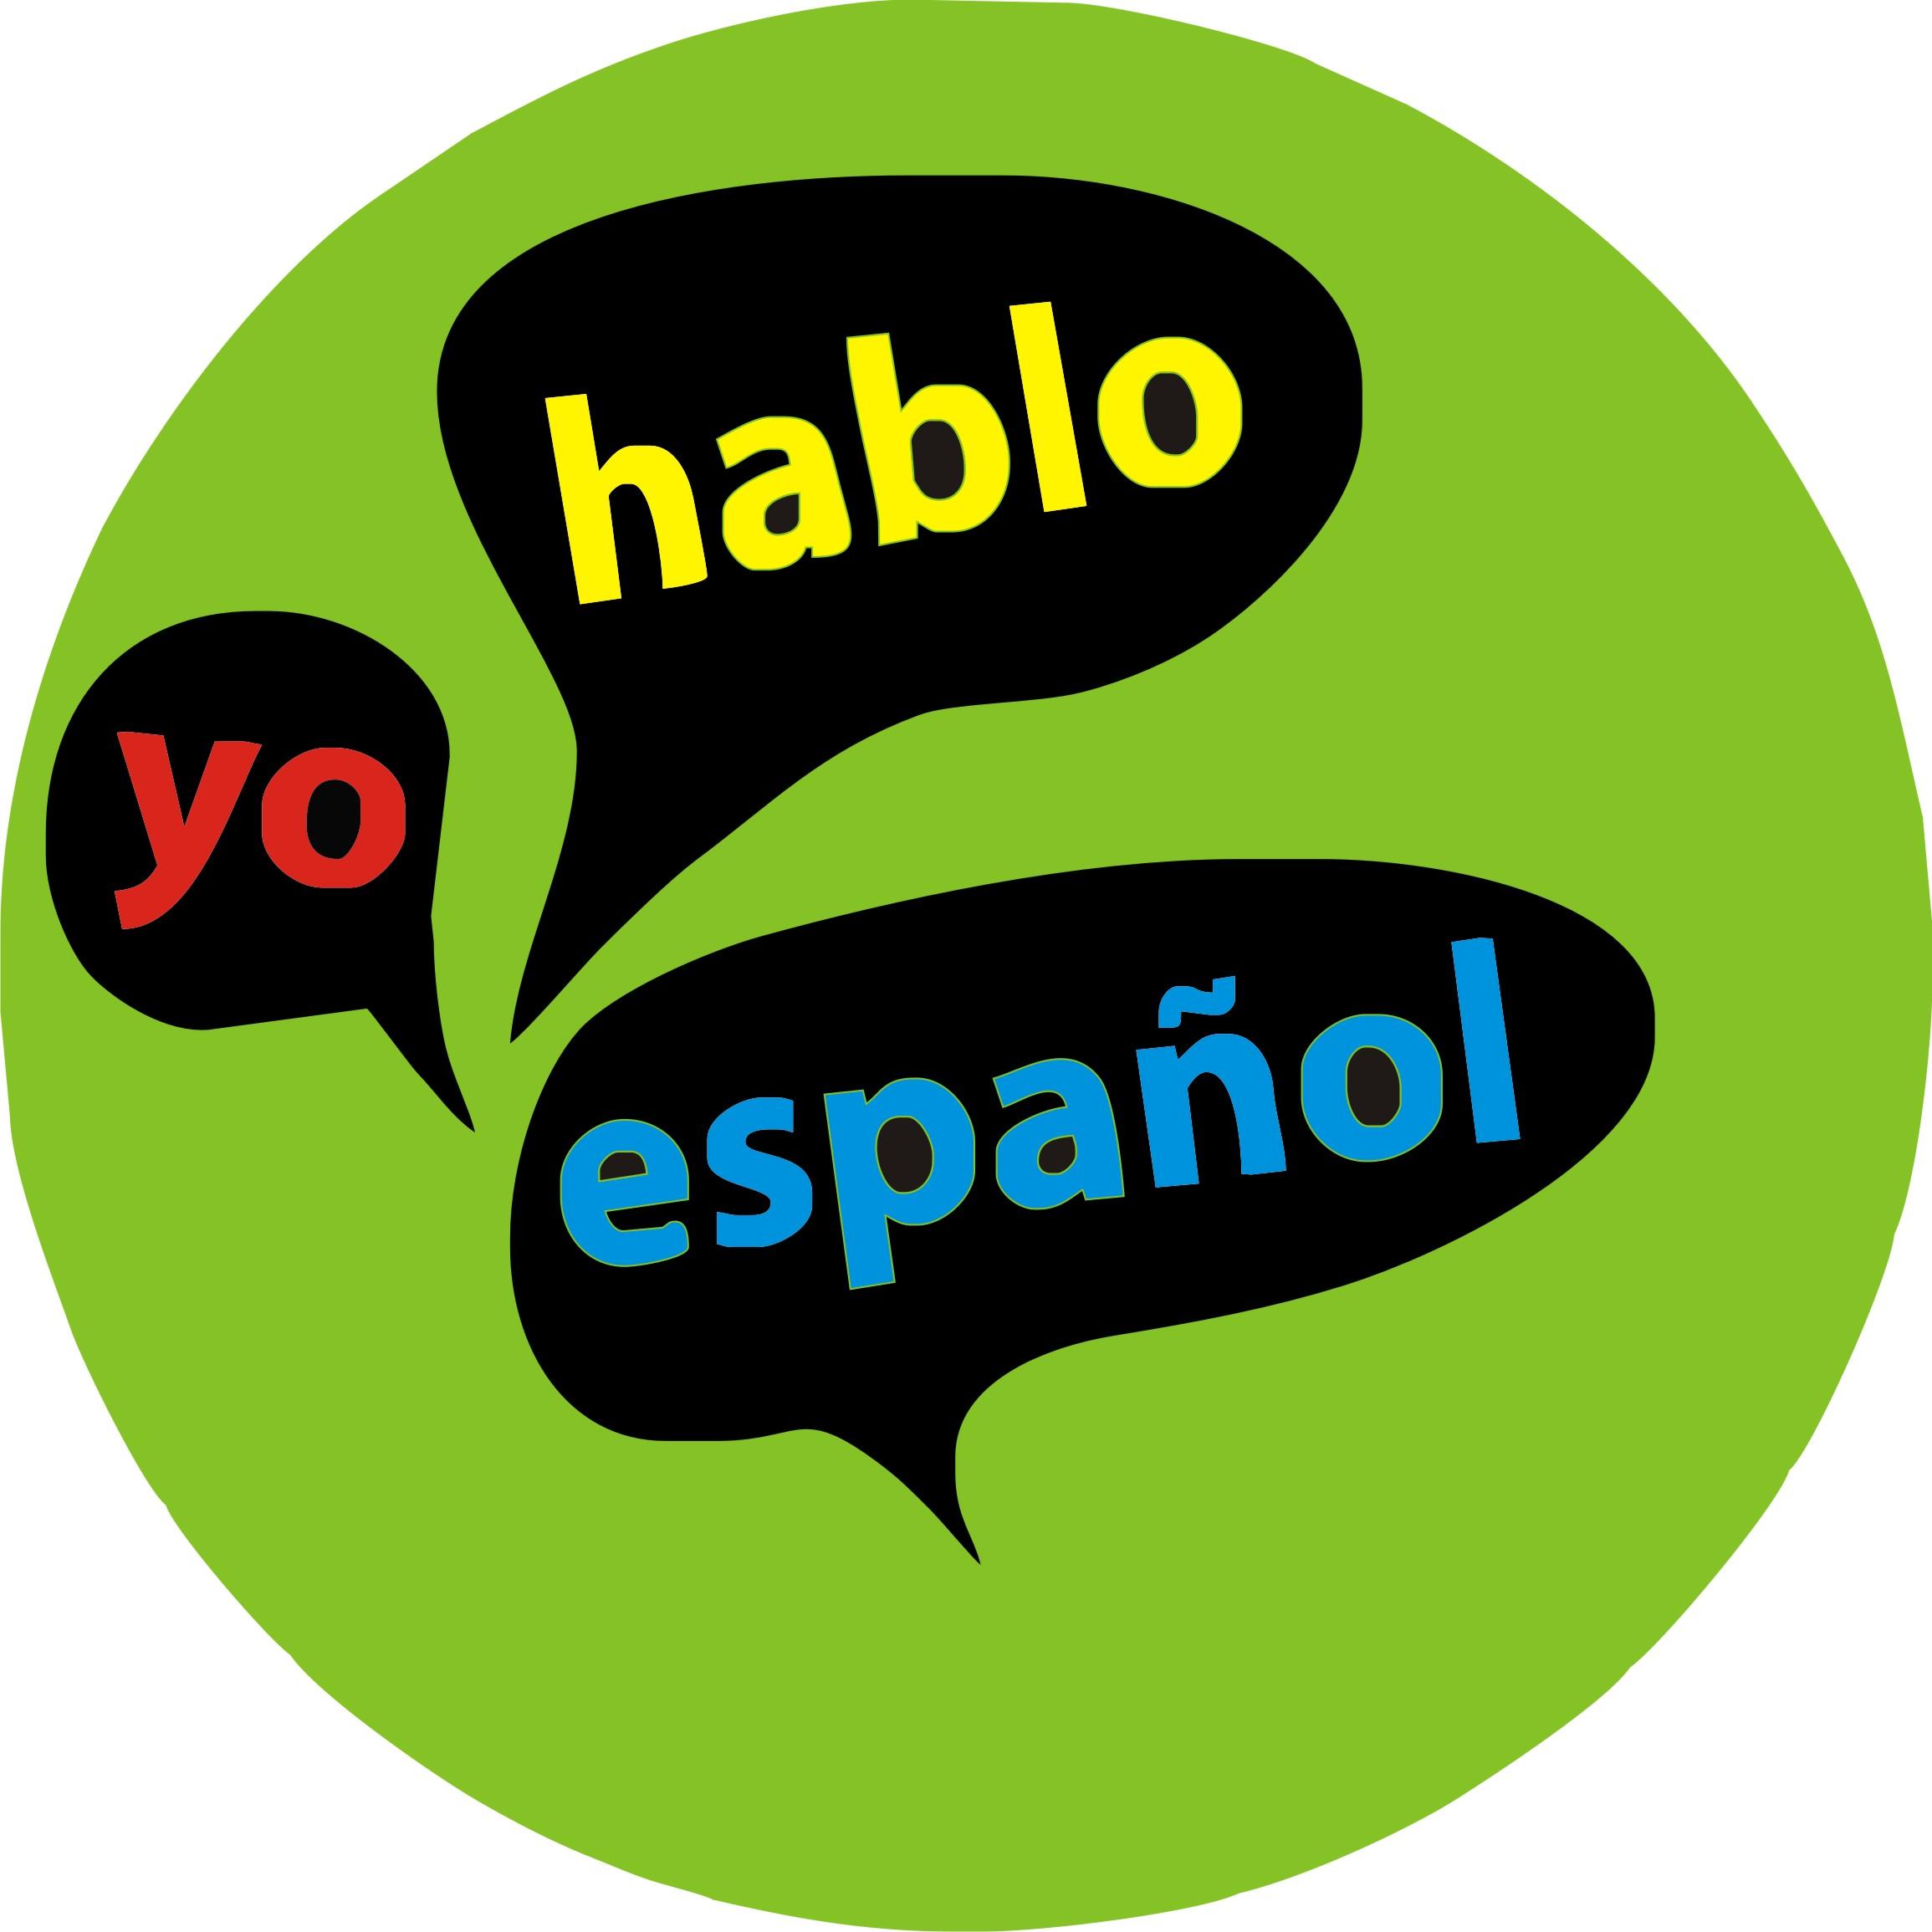 Spanish clipart.